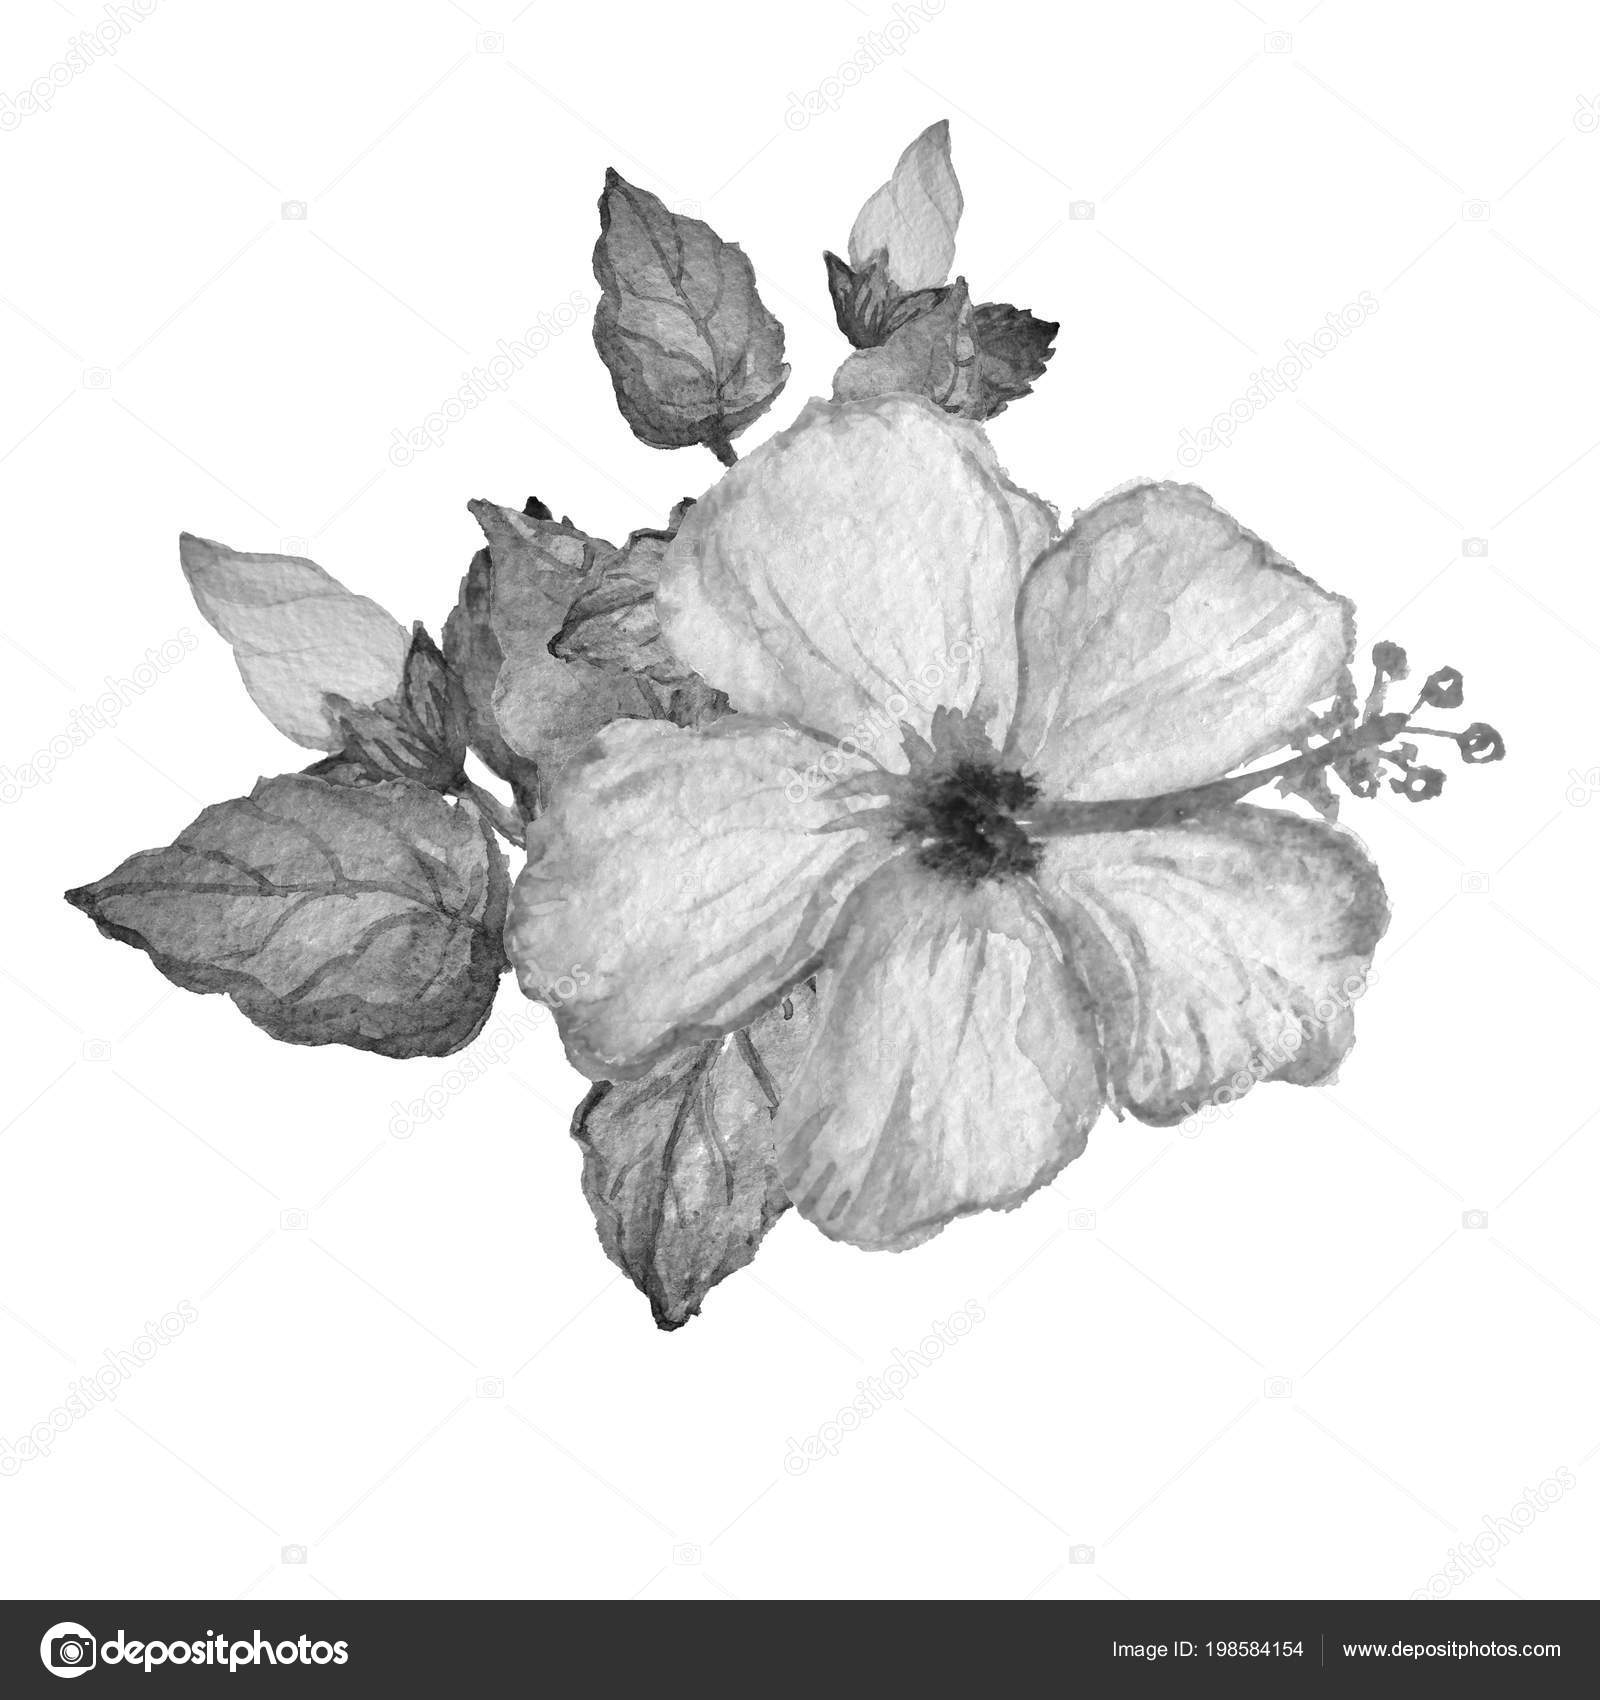 Decorative Watercolor Hibiscus Flowers Clipart Design Element Can